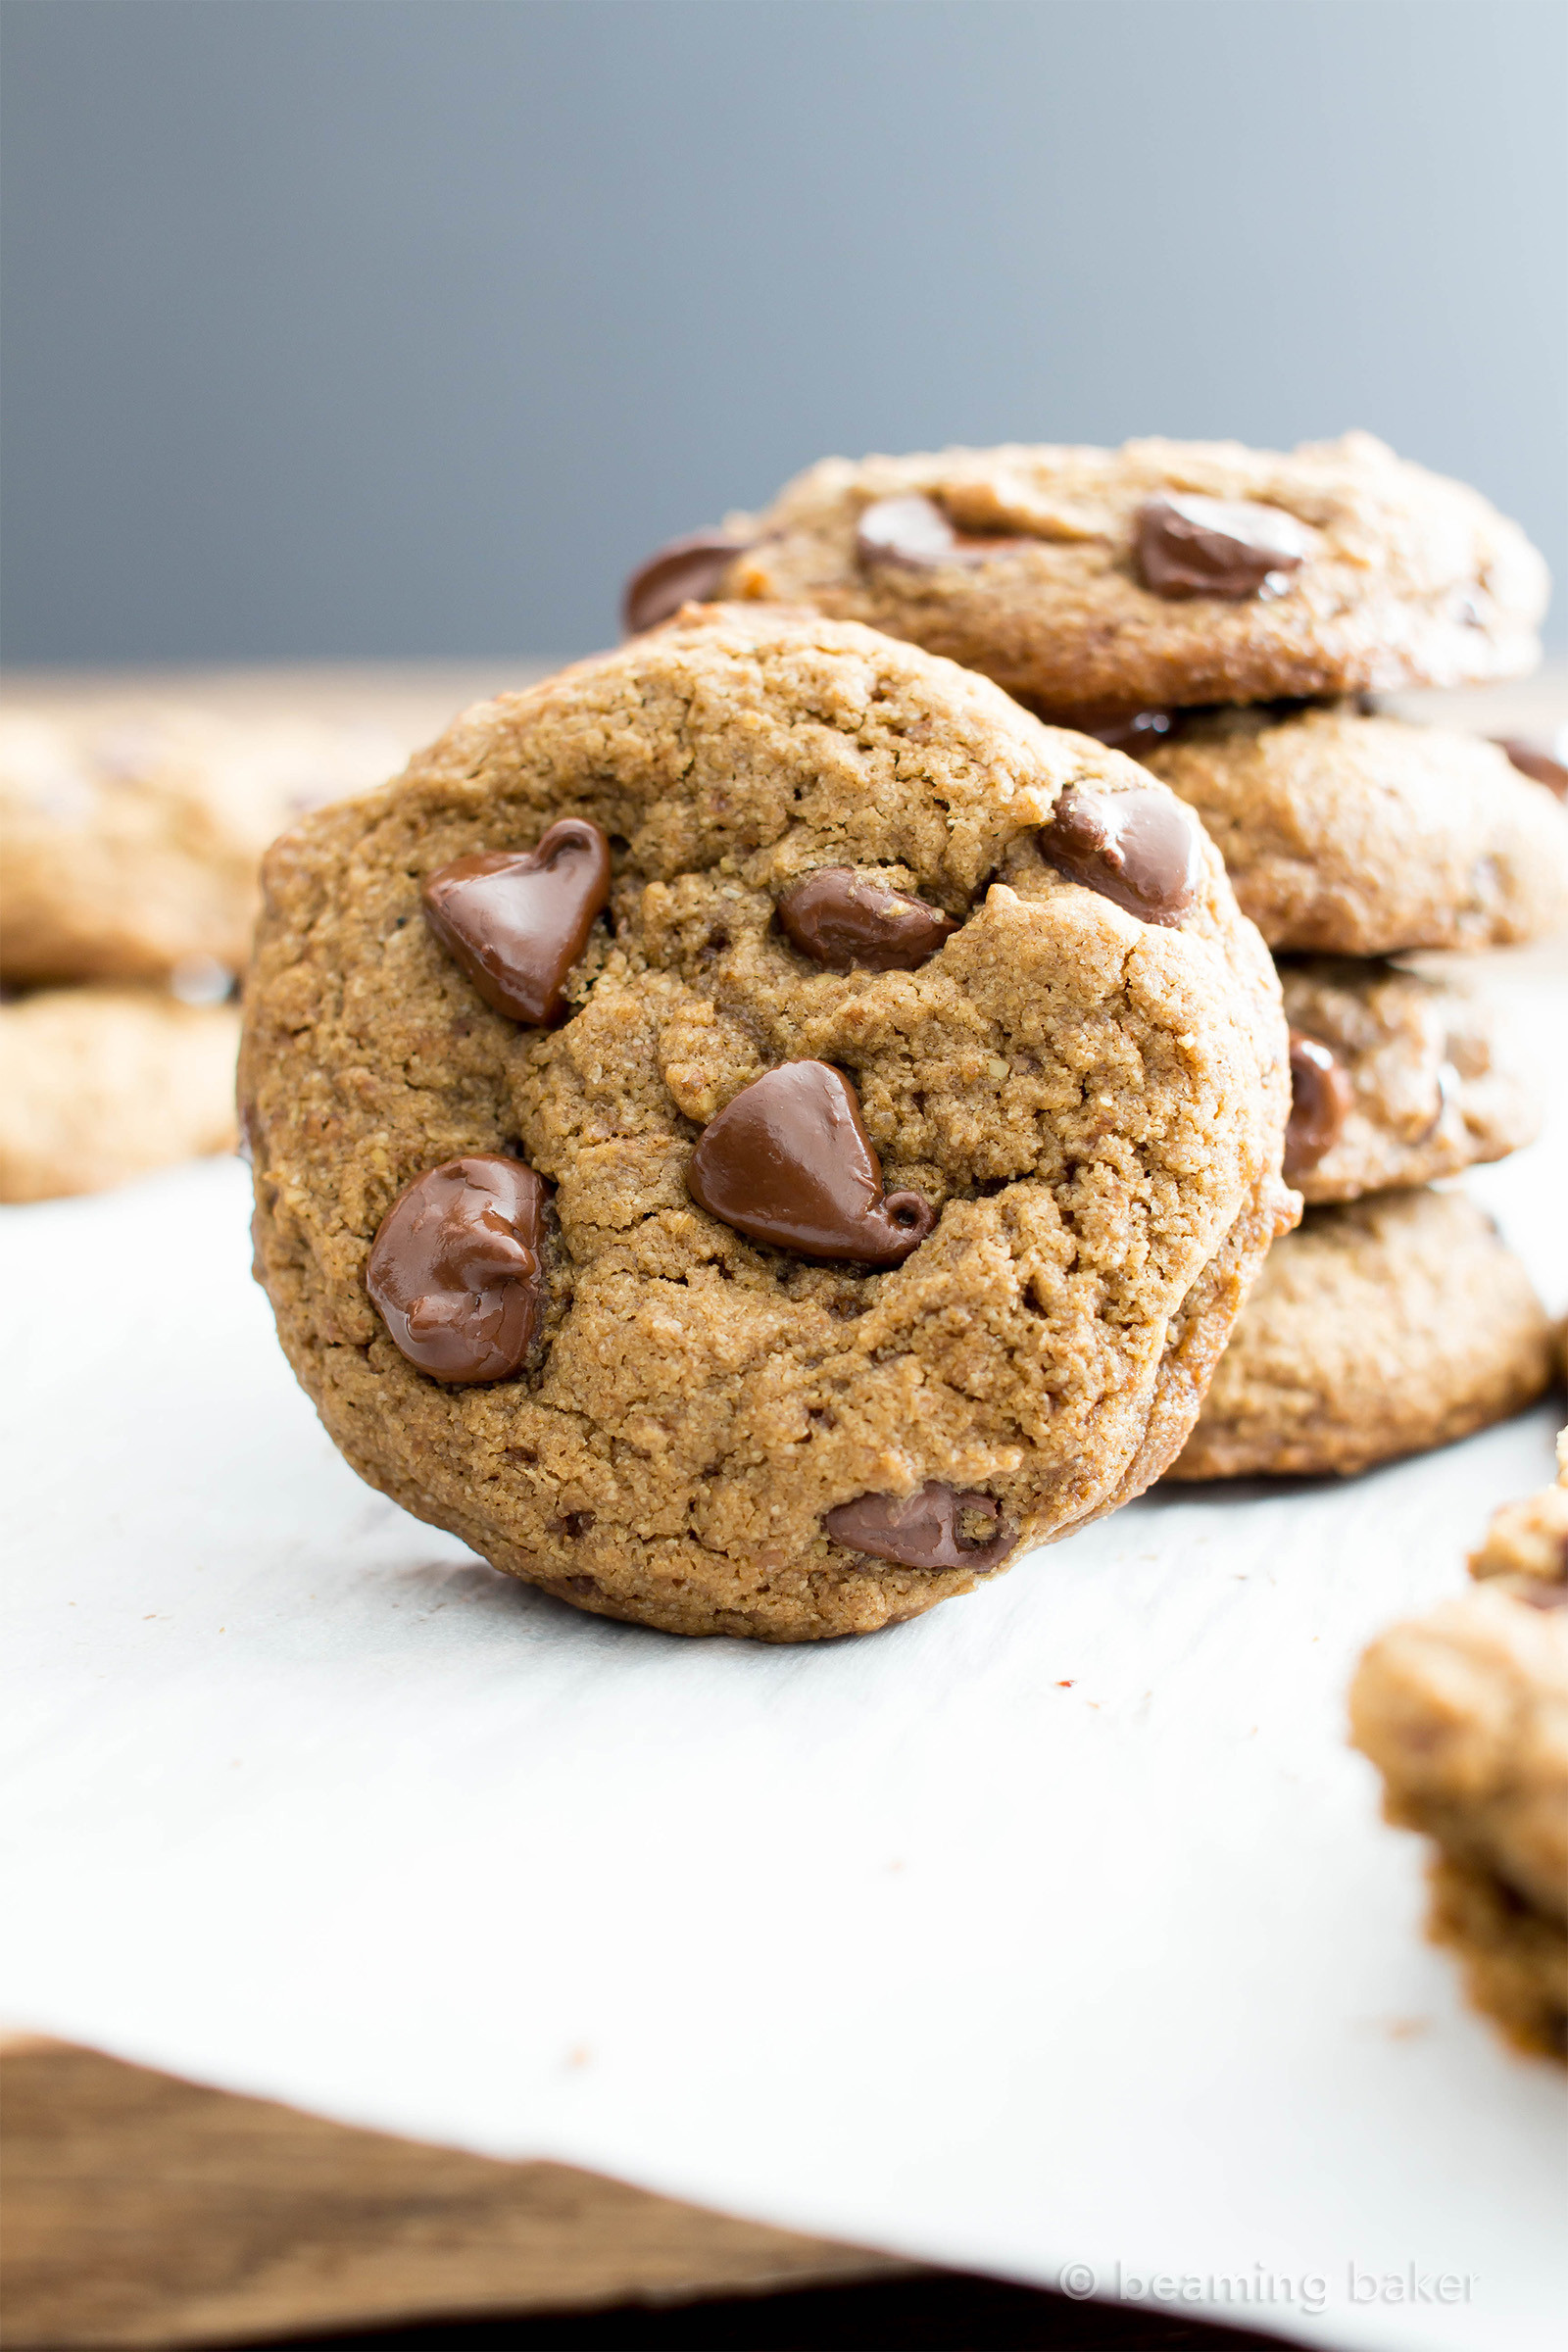 Vegan Cookie Recipes  Vegan Chocolate Chip Cookies Recipe Gluten Free Dairy